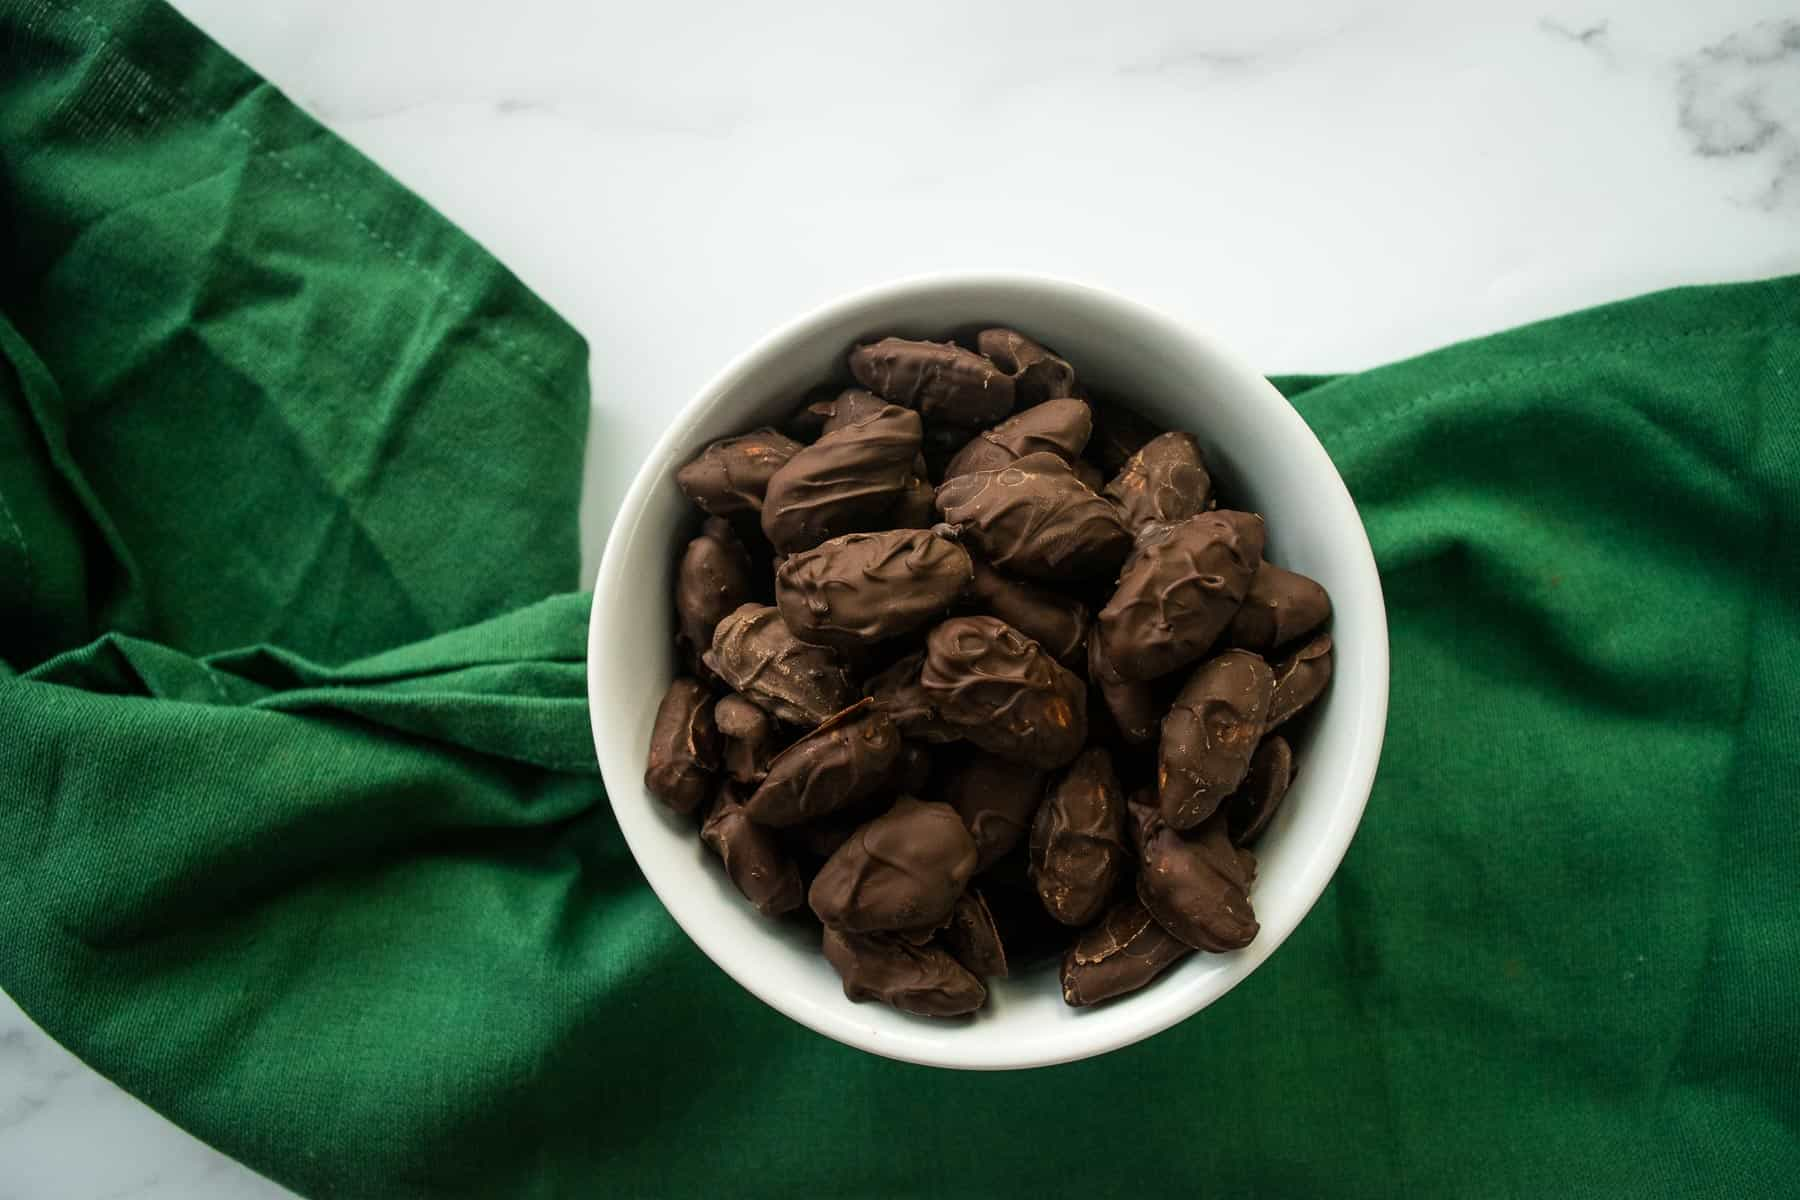 Chocolate almonds.